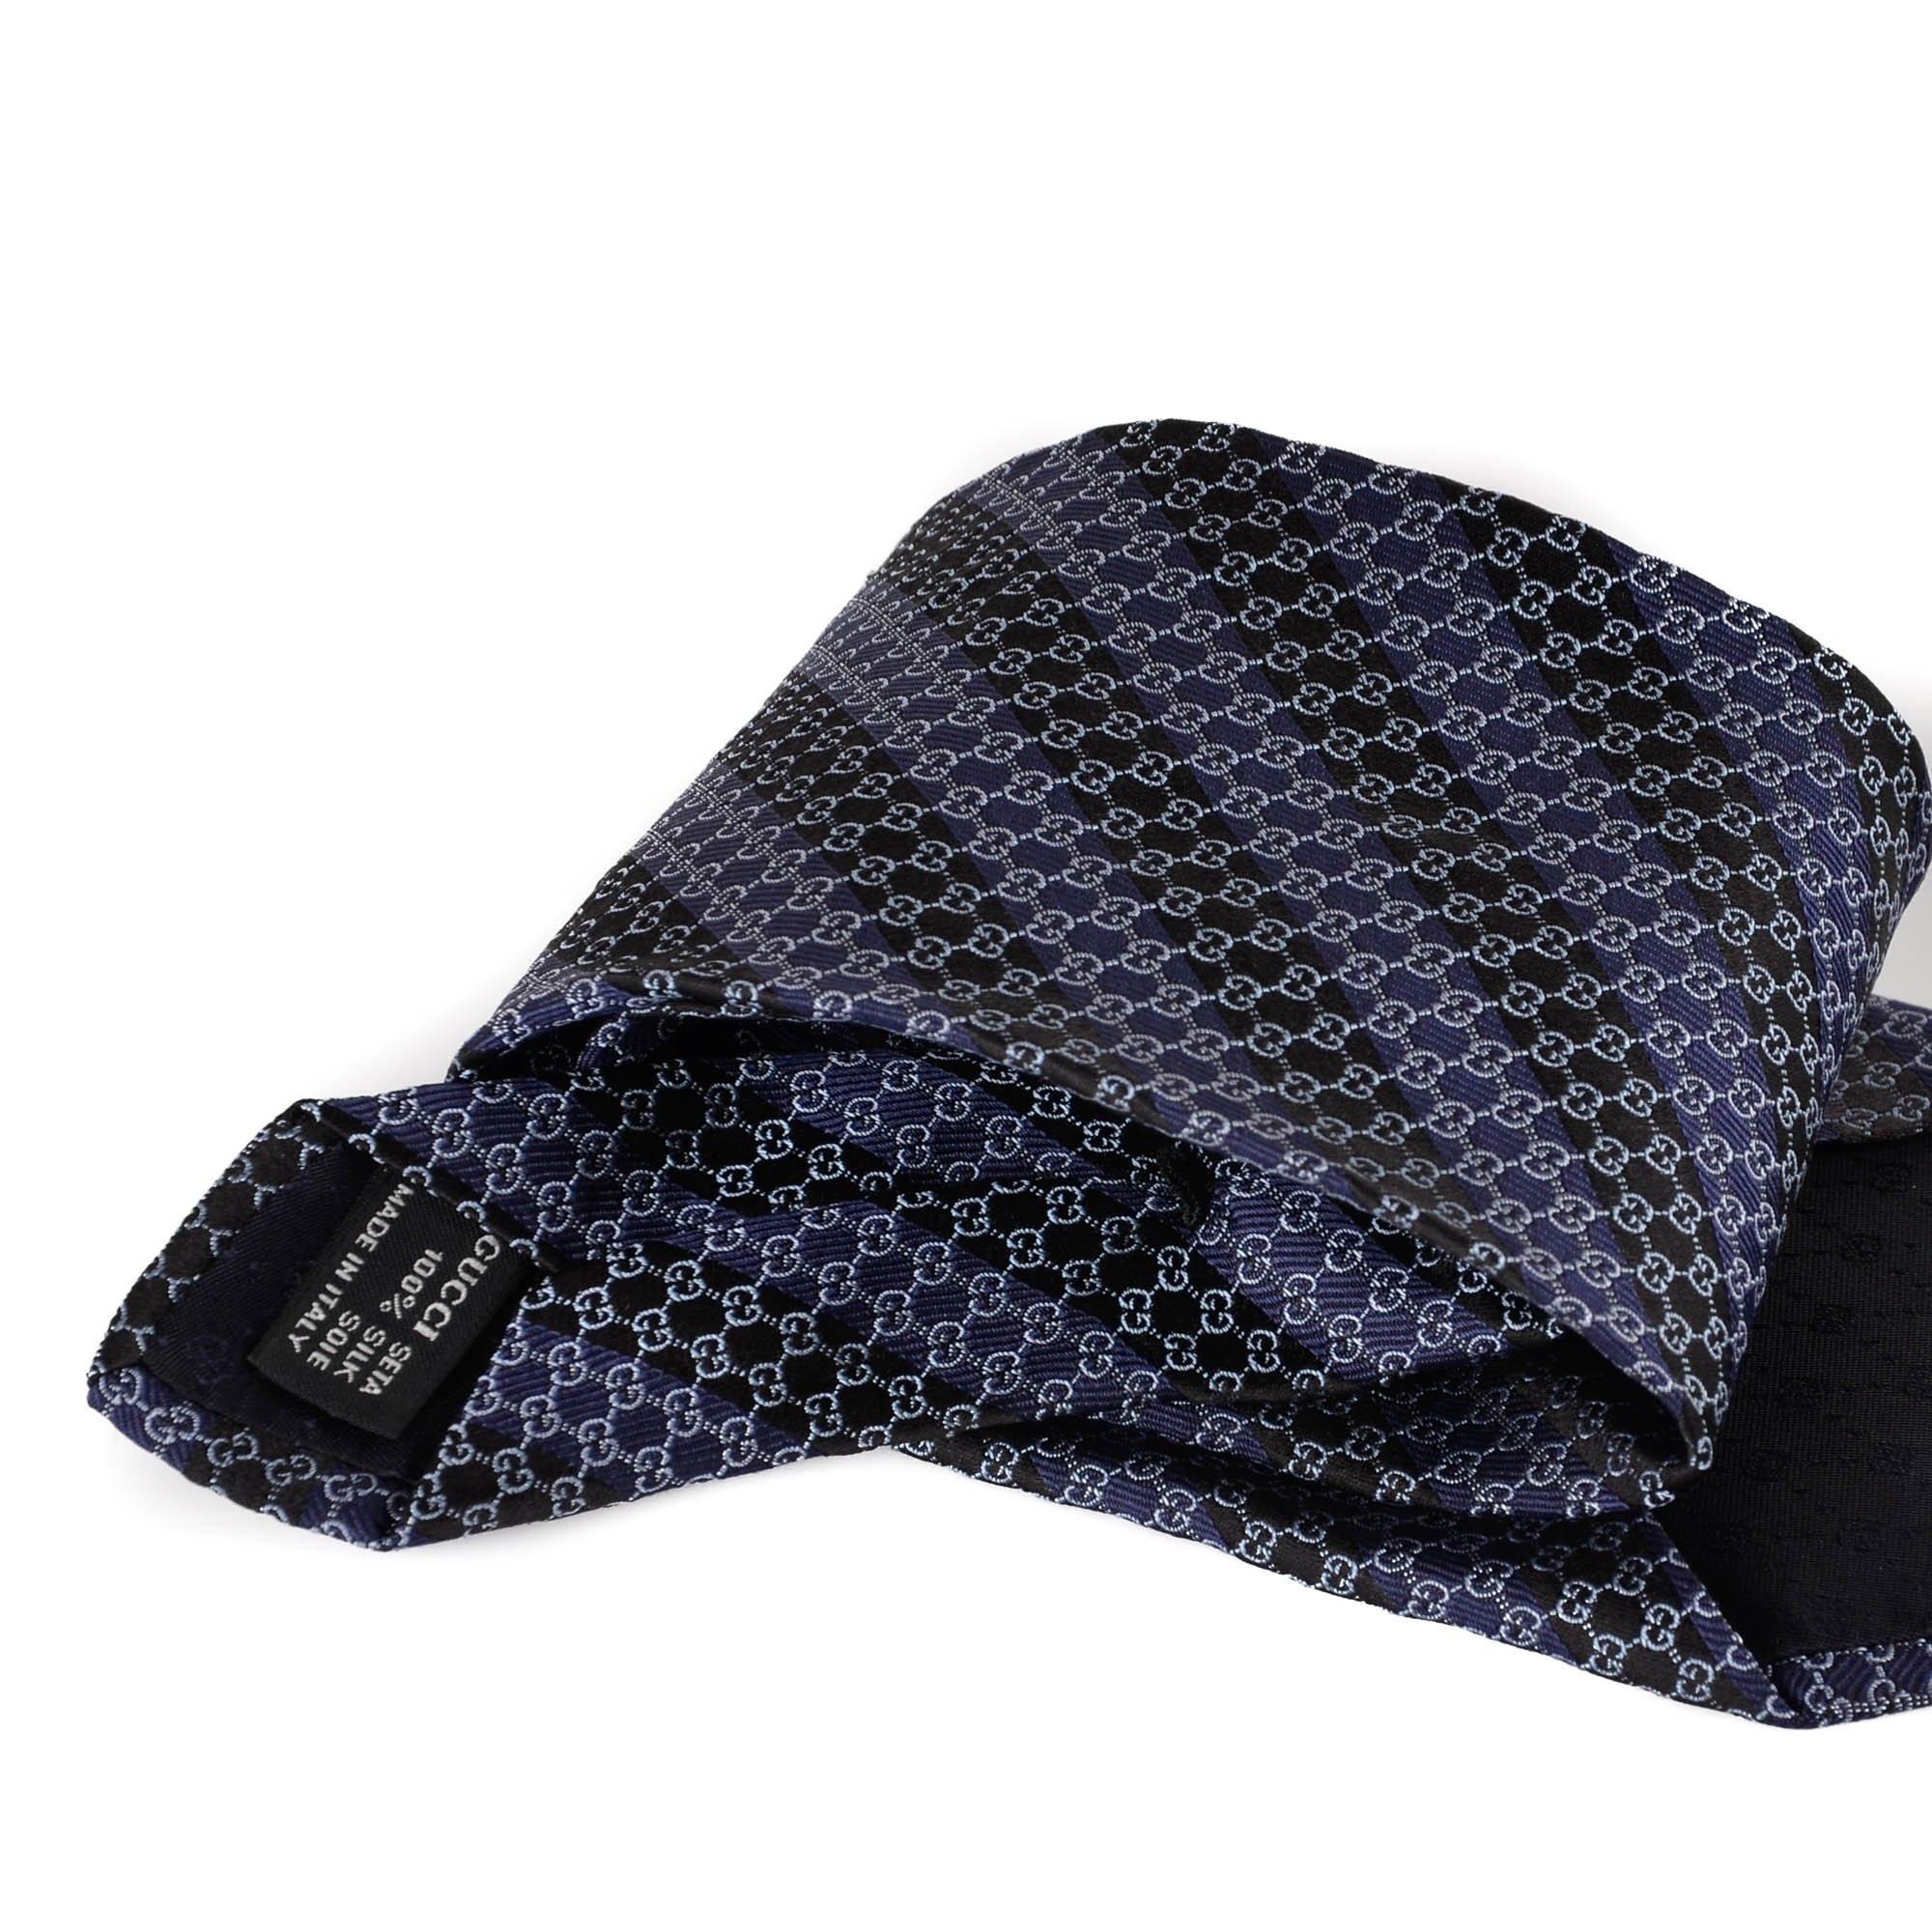 c0225e3dbd79b Striped Dark Blue GG Silk Tie - My Luxury Bargain